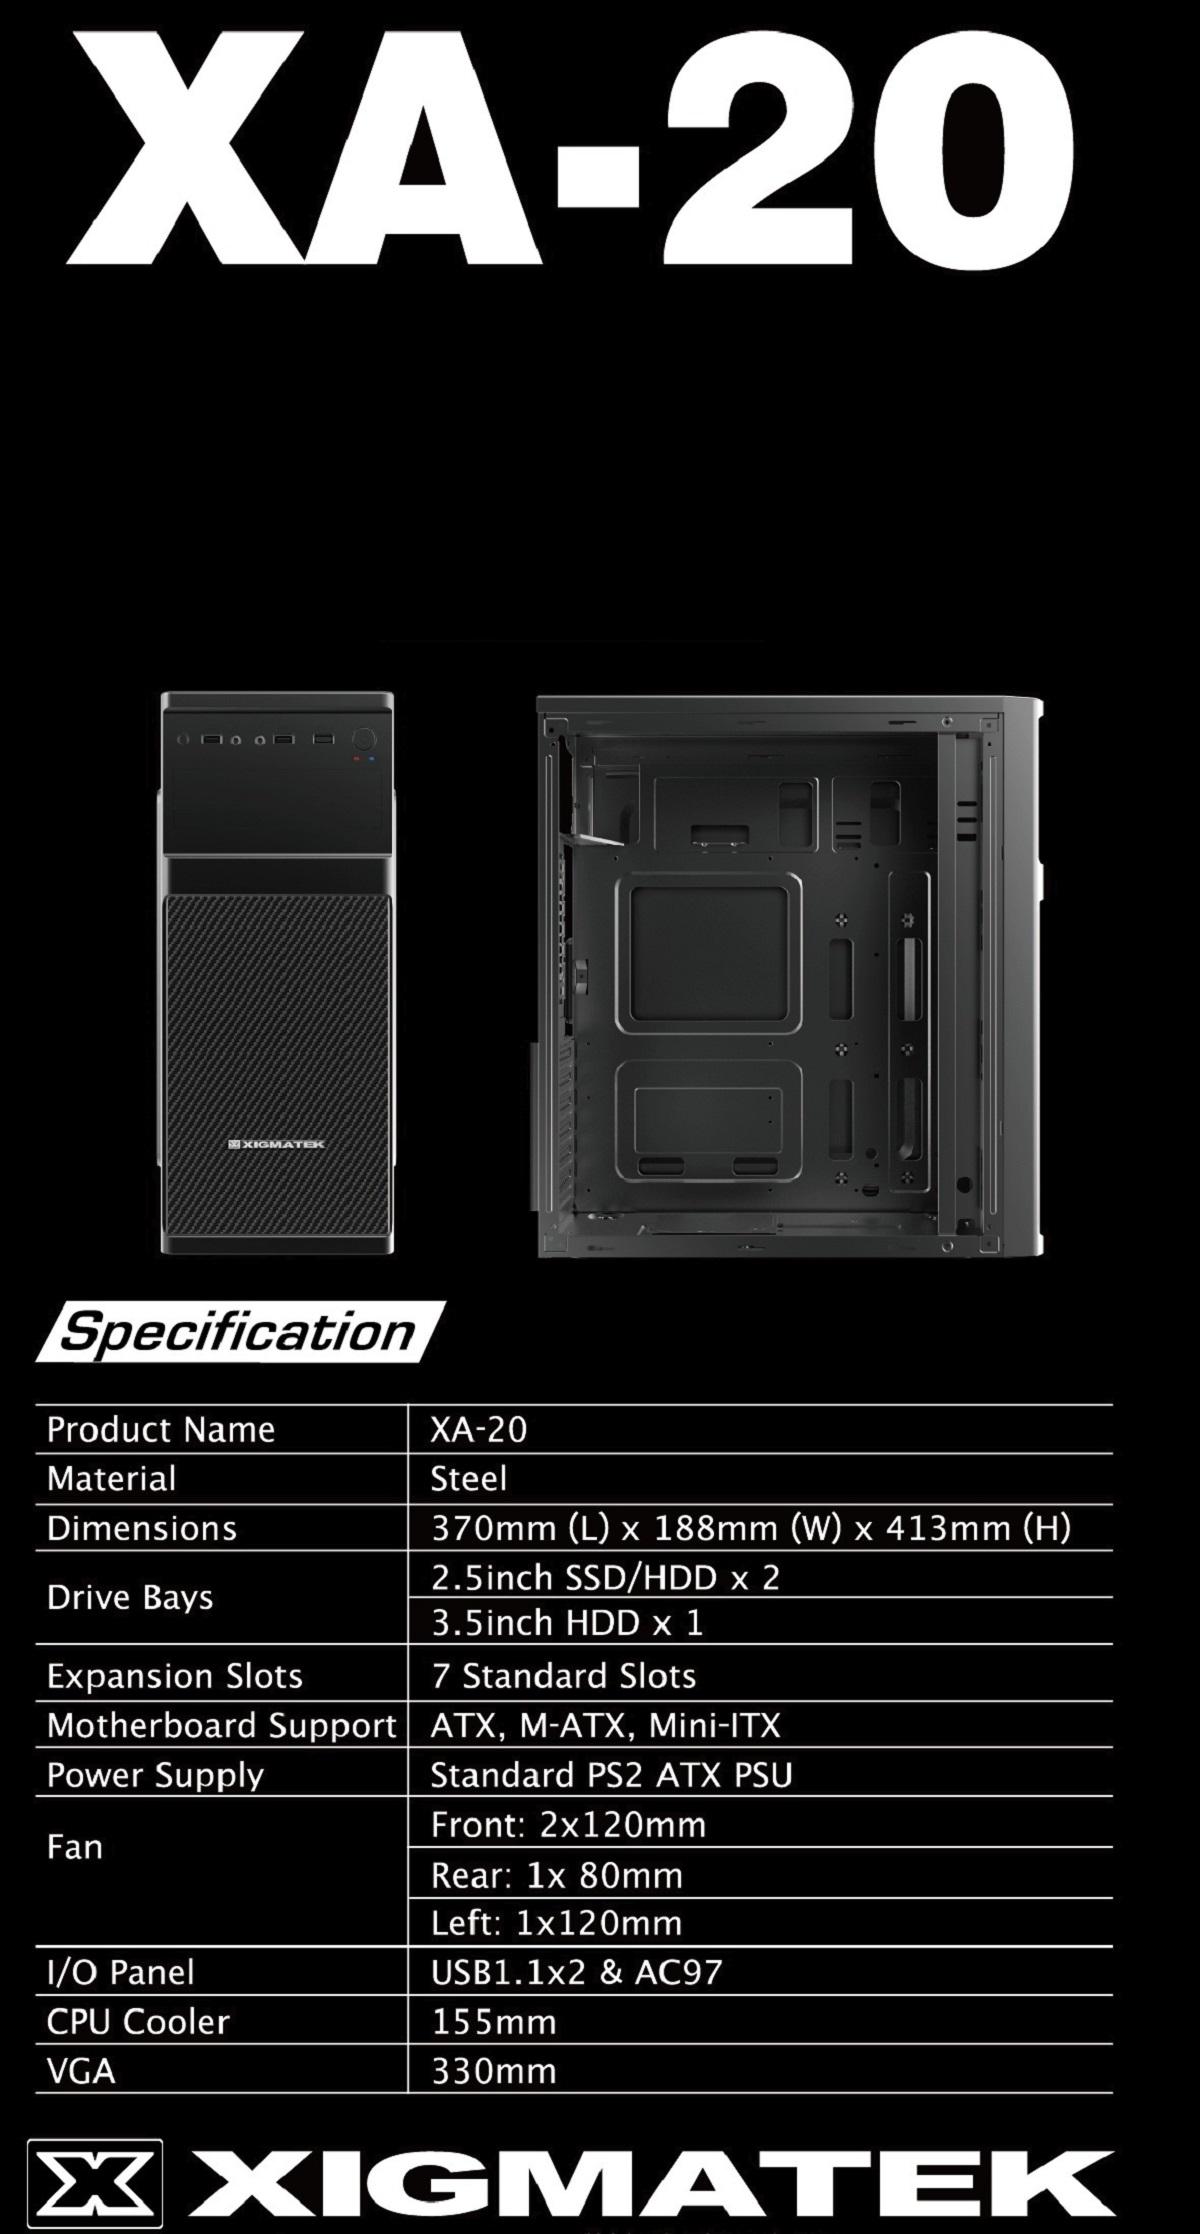 Xigmatek XA-20 giới thiệu